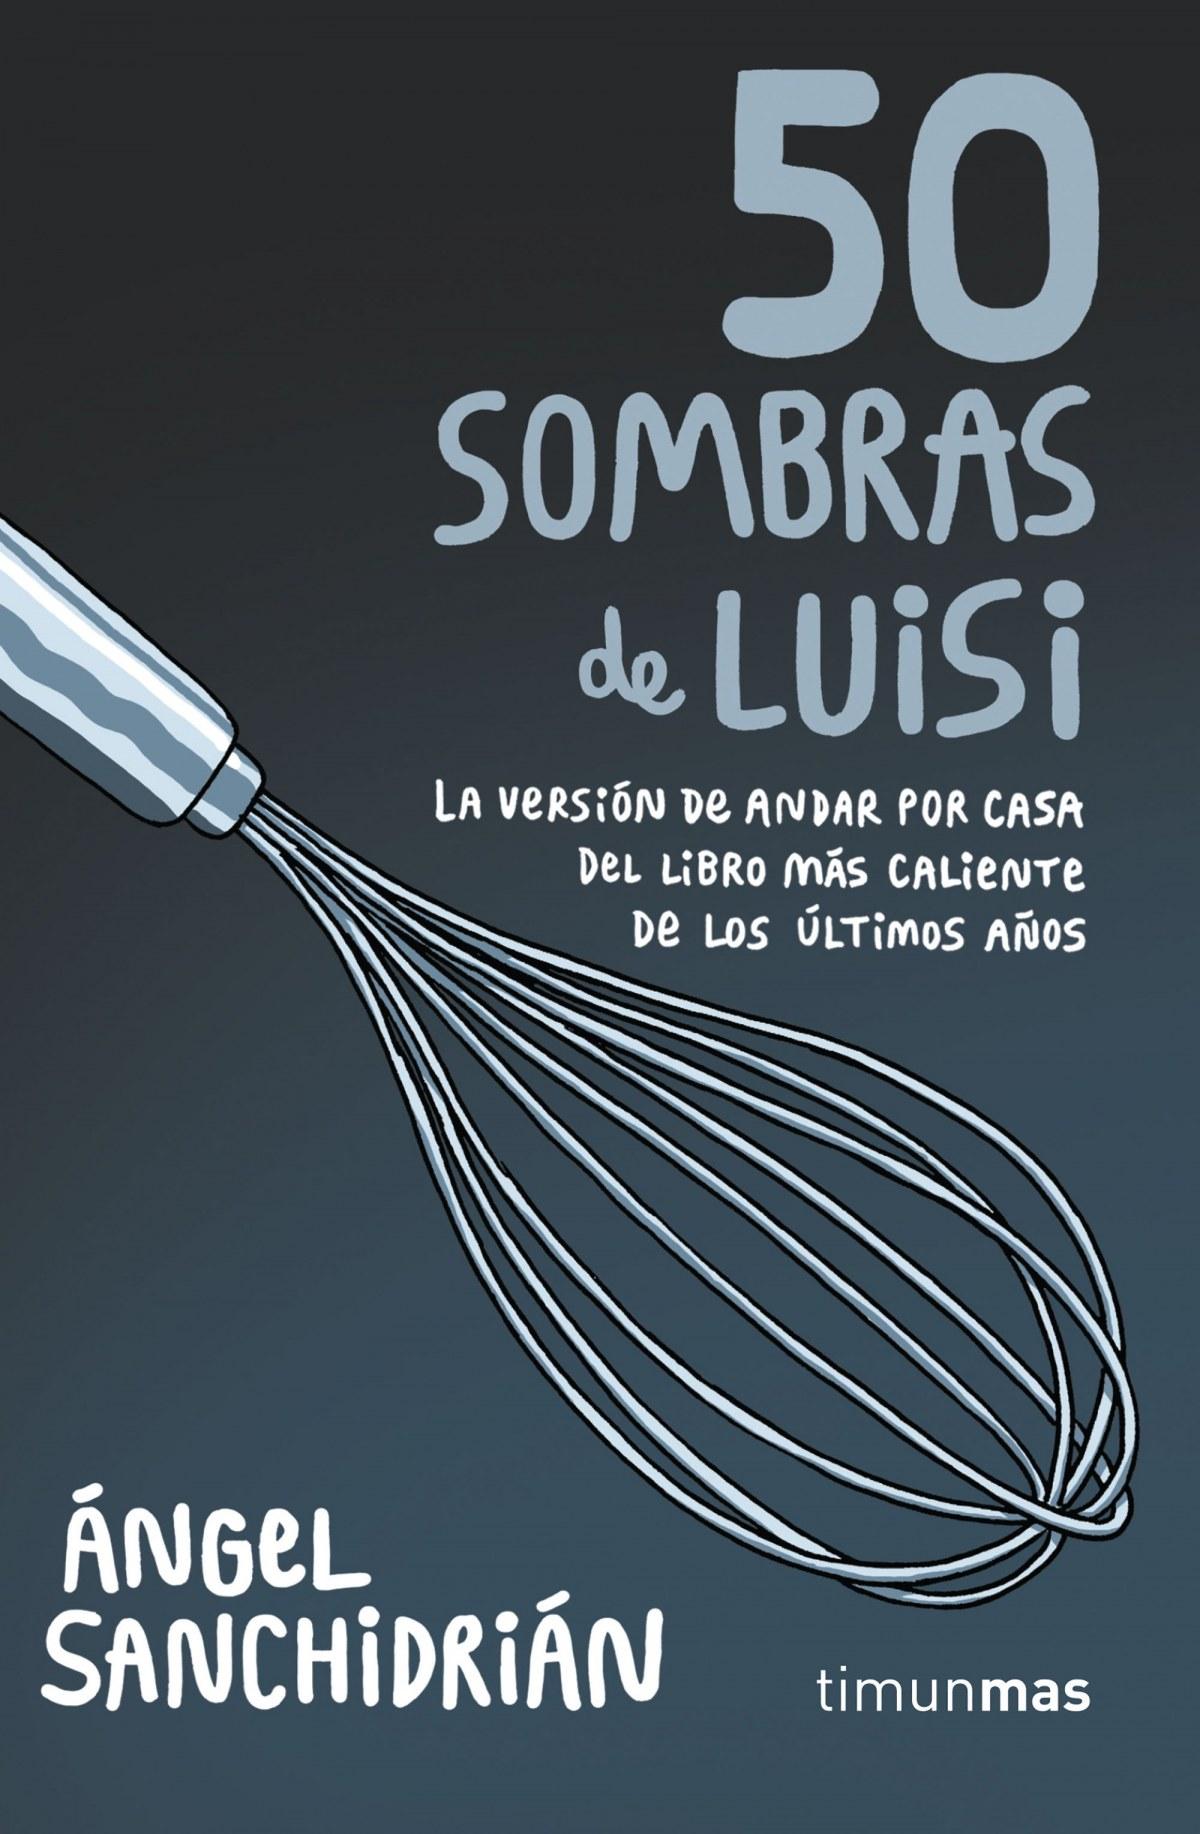 50 SOMBRAS DE LUISI 9788445004975